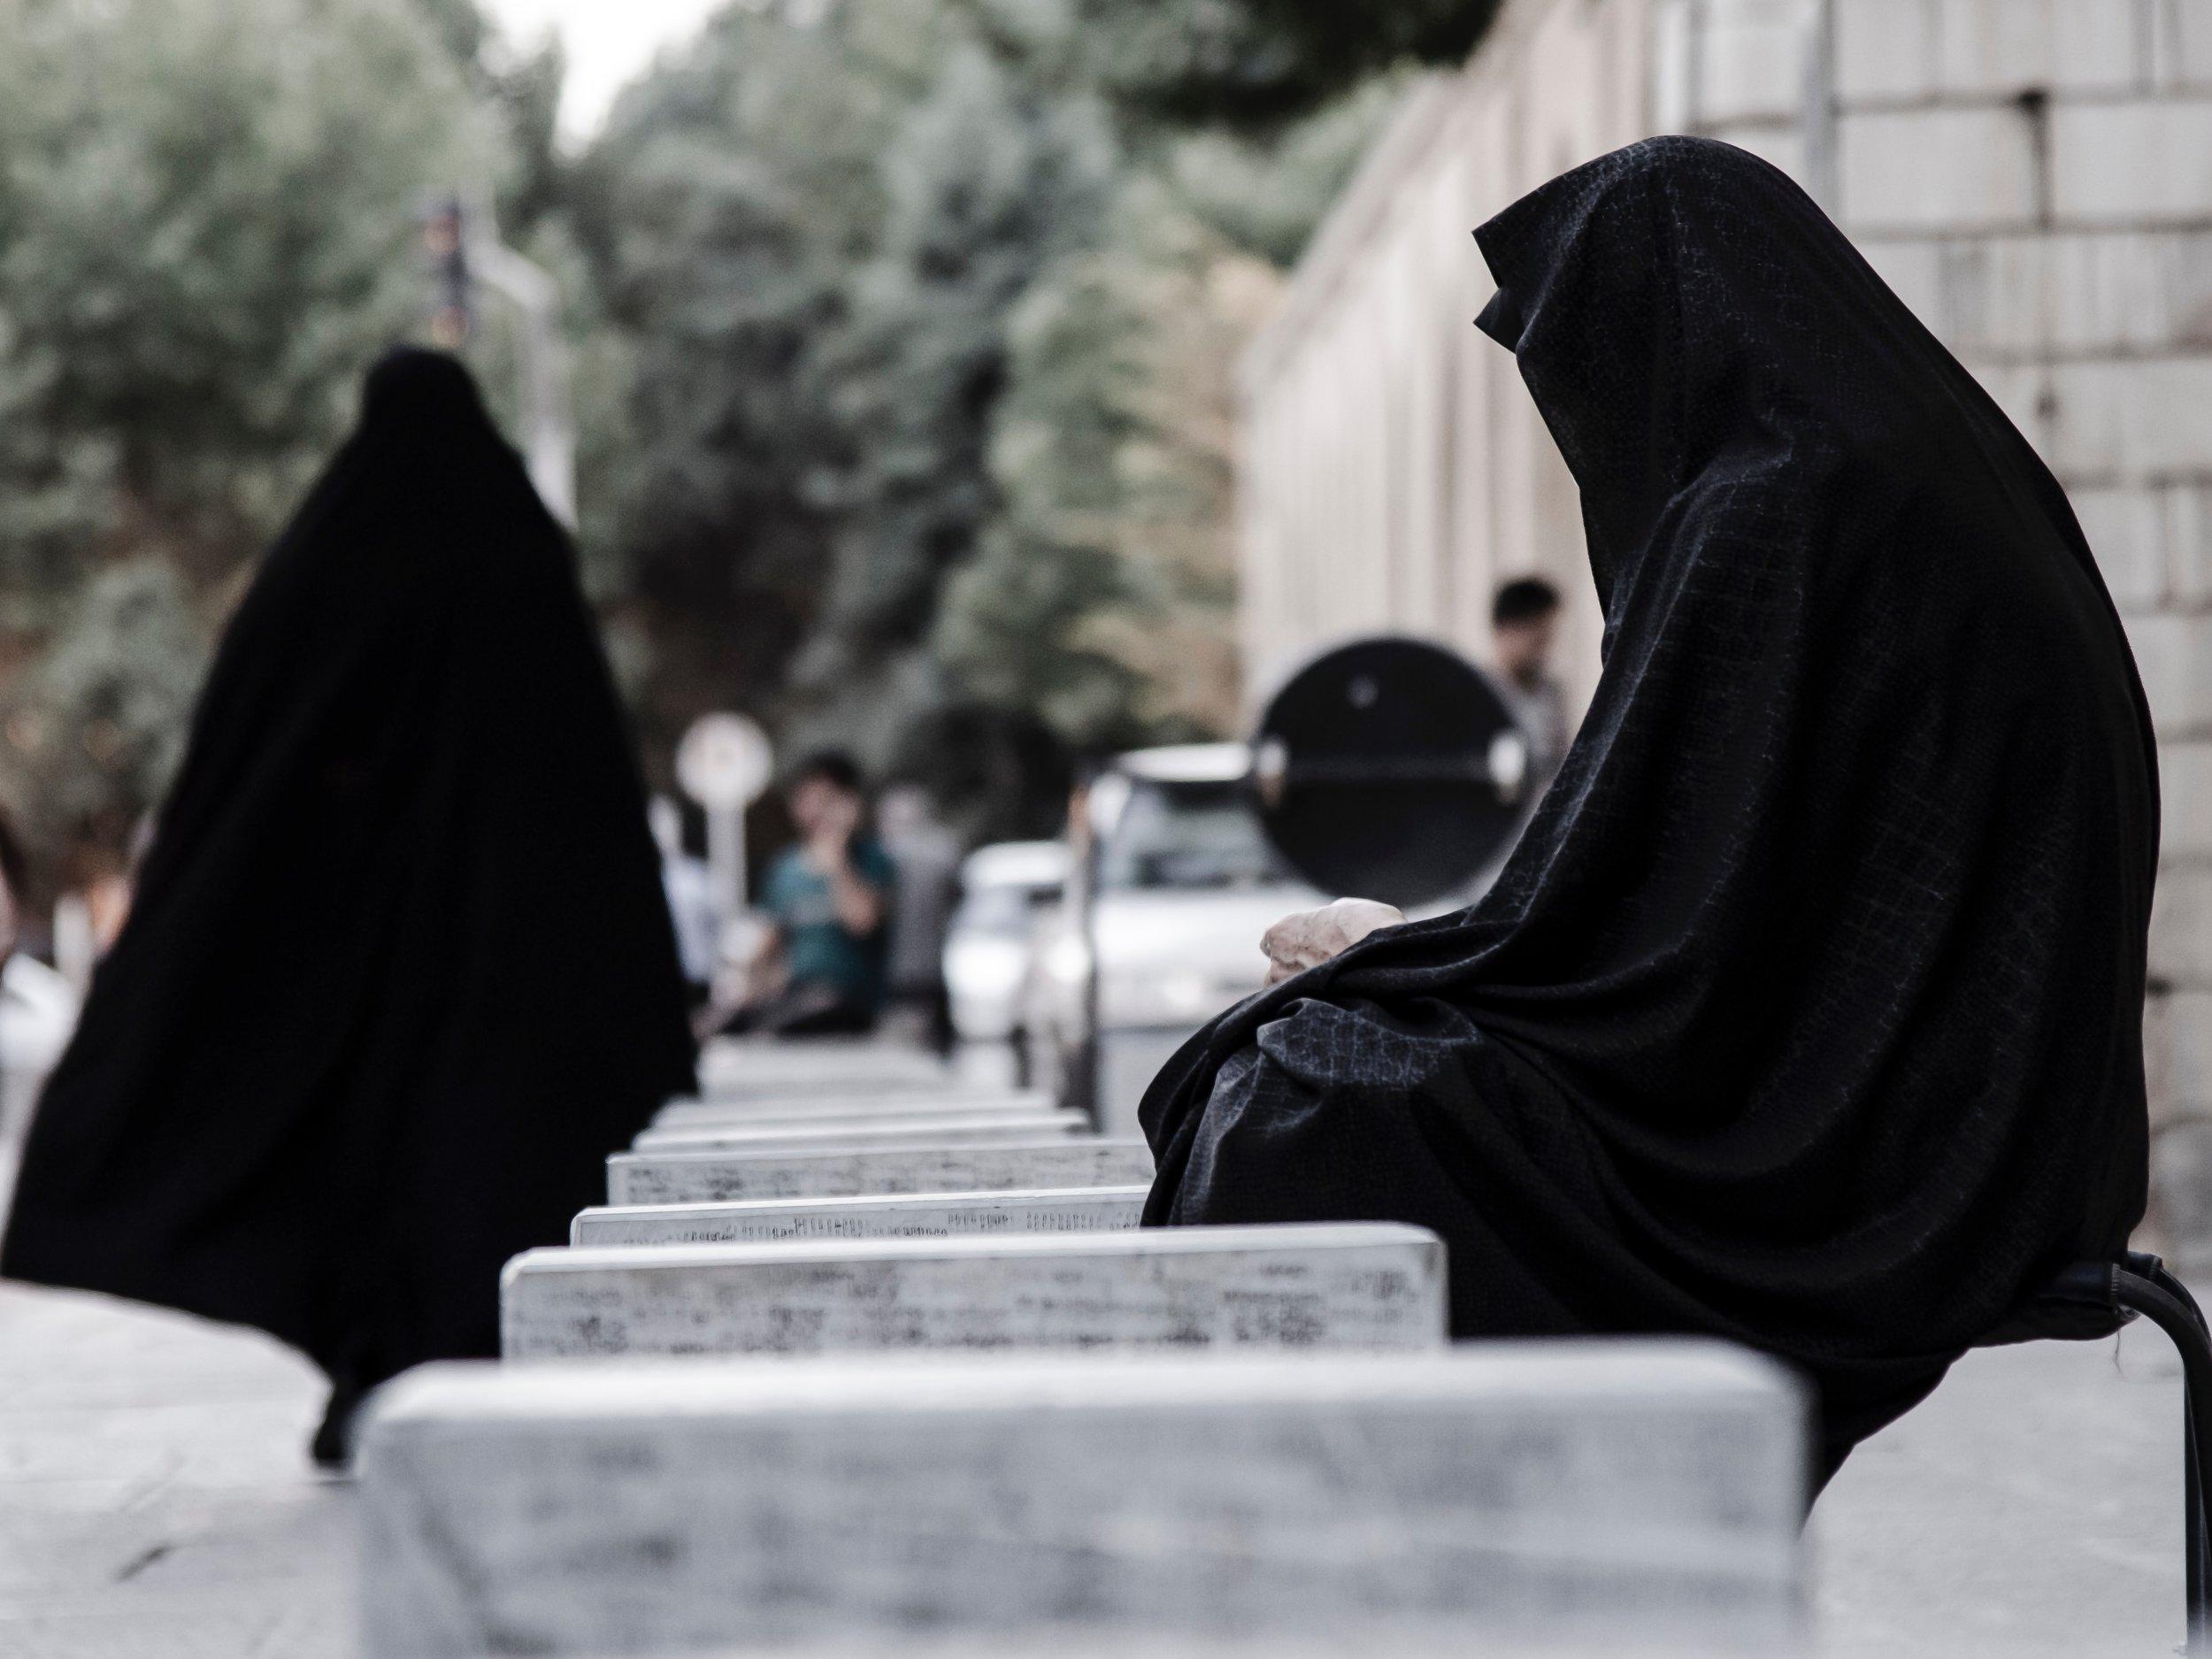 majid-korang-beheshti-Qg-4RWfwbkY-unsplash.jpg